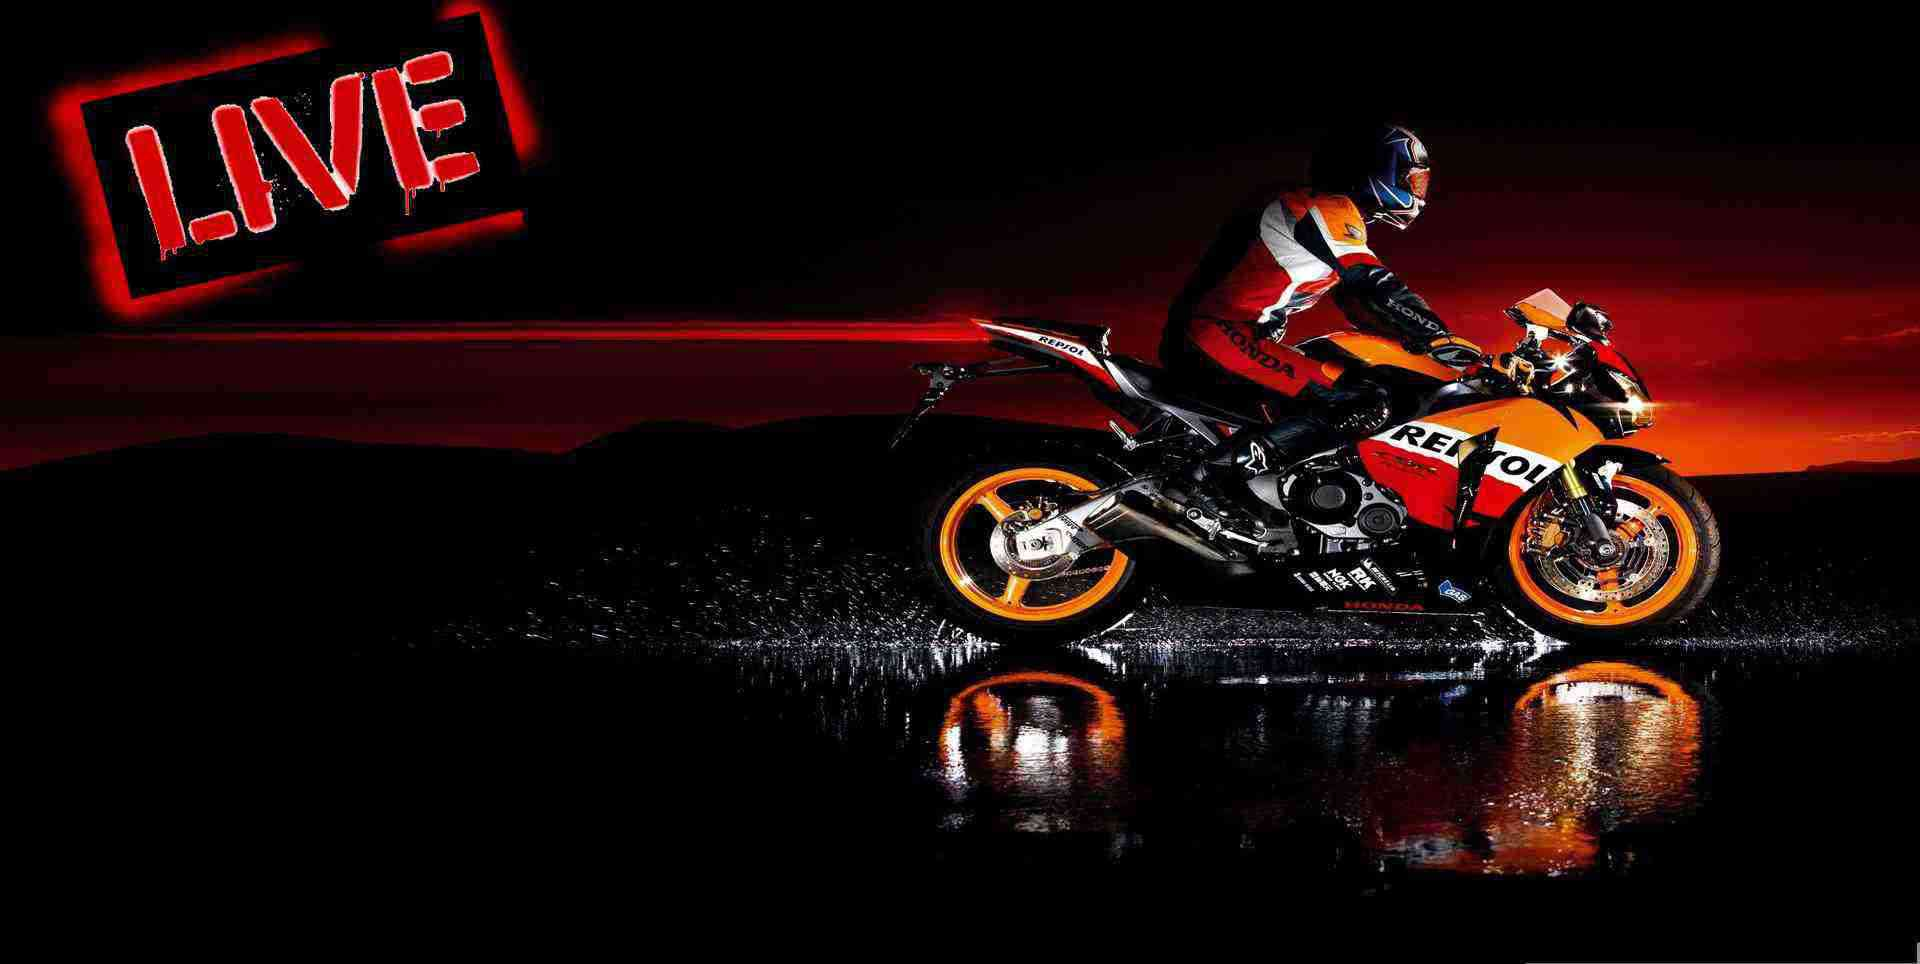 San Marino MotoGP 2018 Live Stream